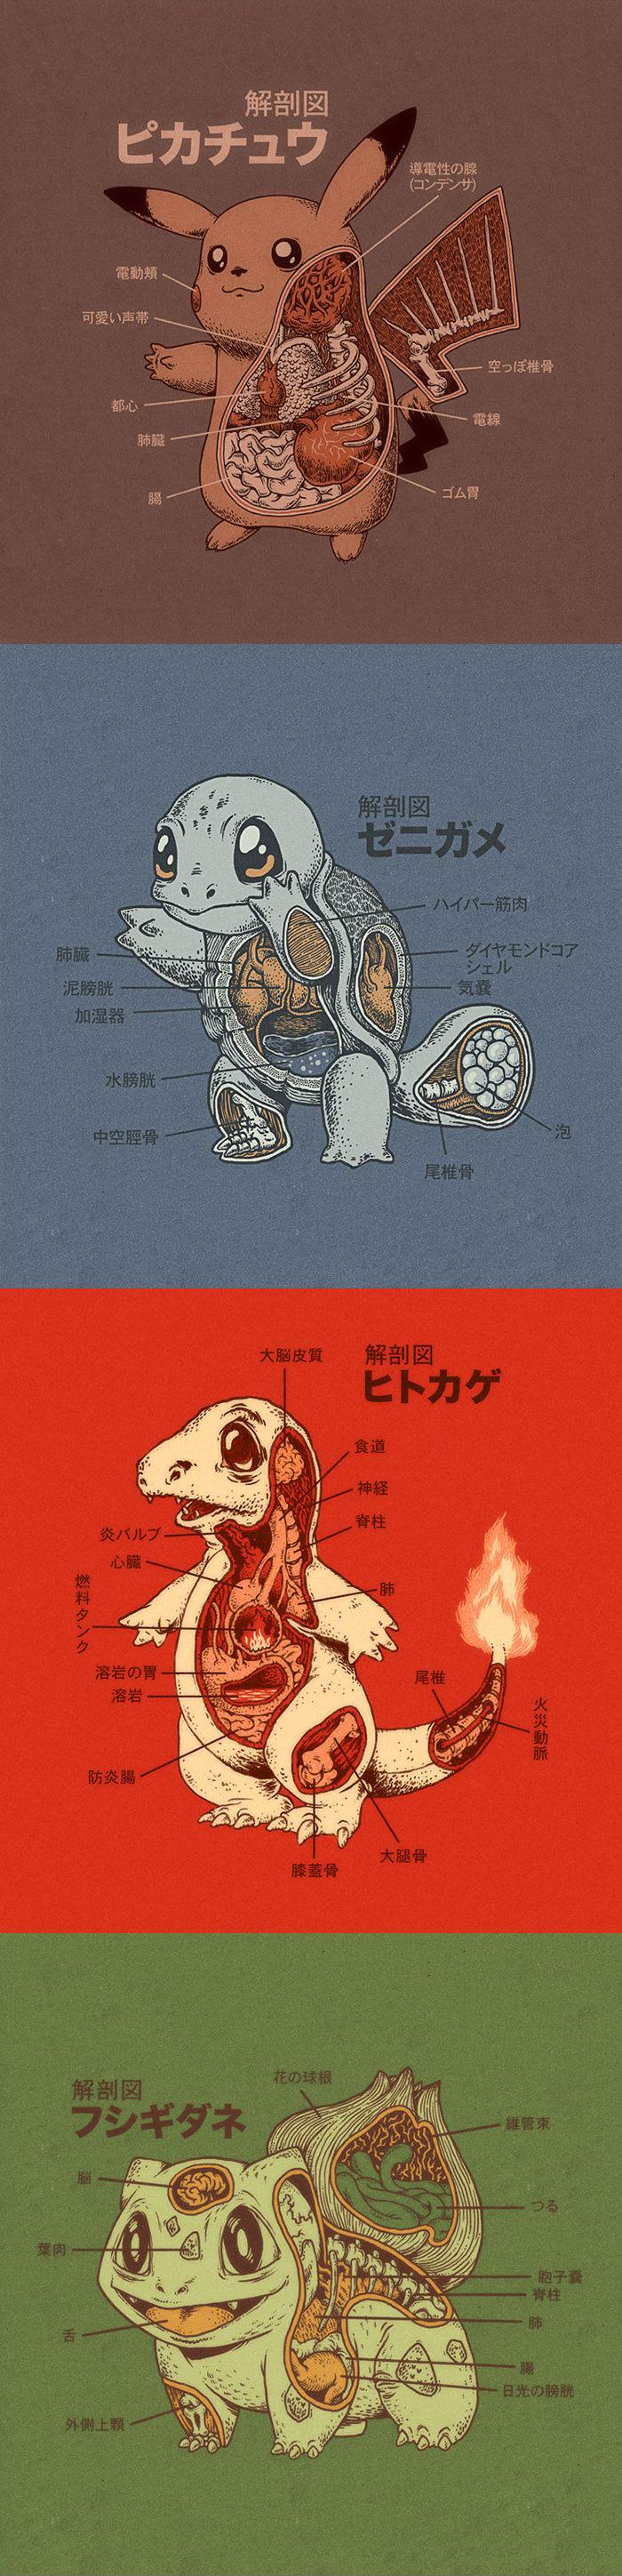 Pokemon Anatomy (English translation) | Pinterest | Pokémon, Anatomy ...